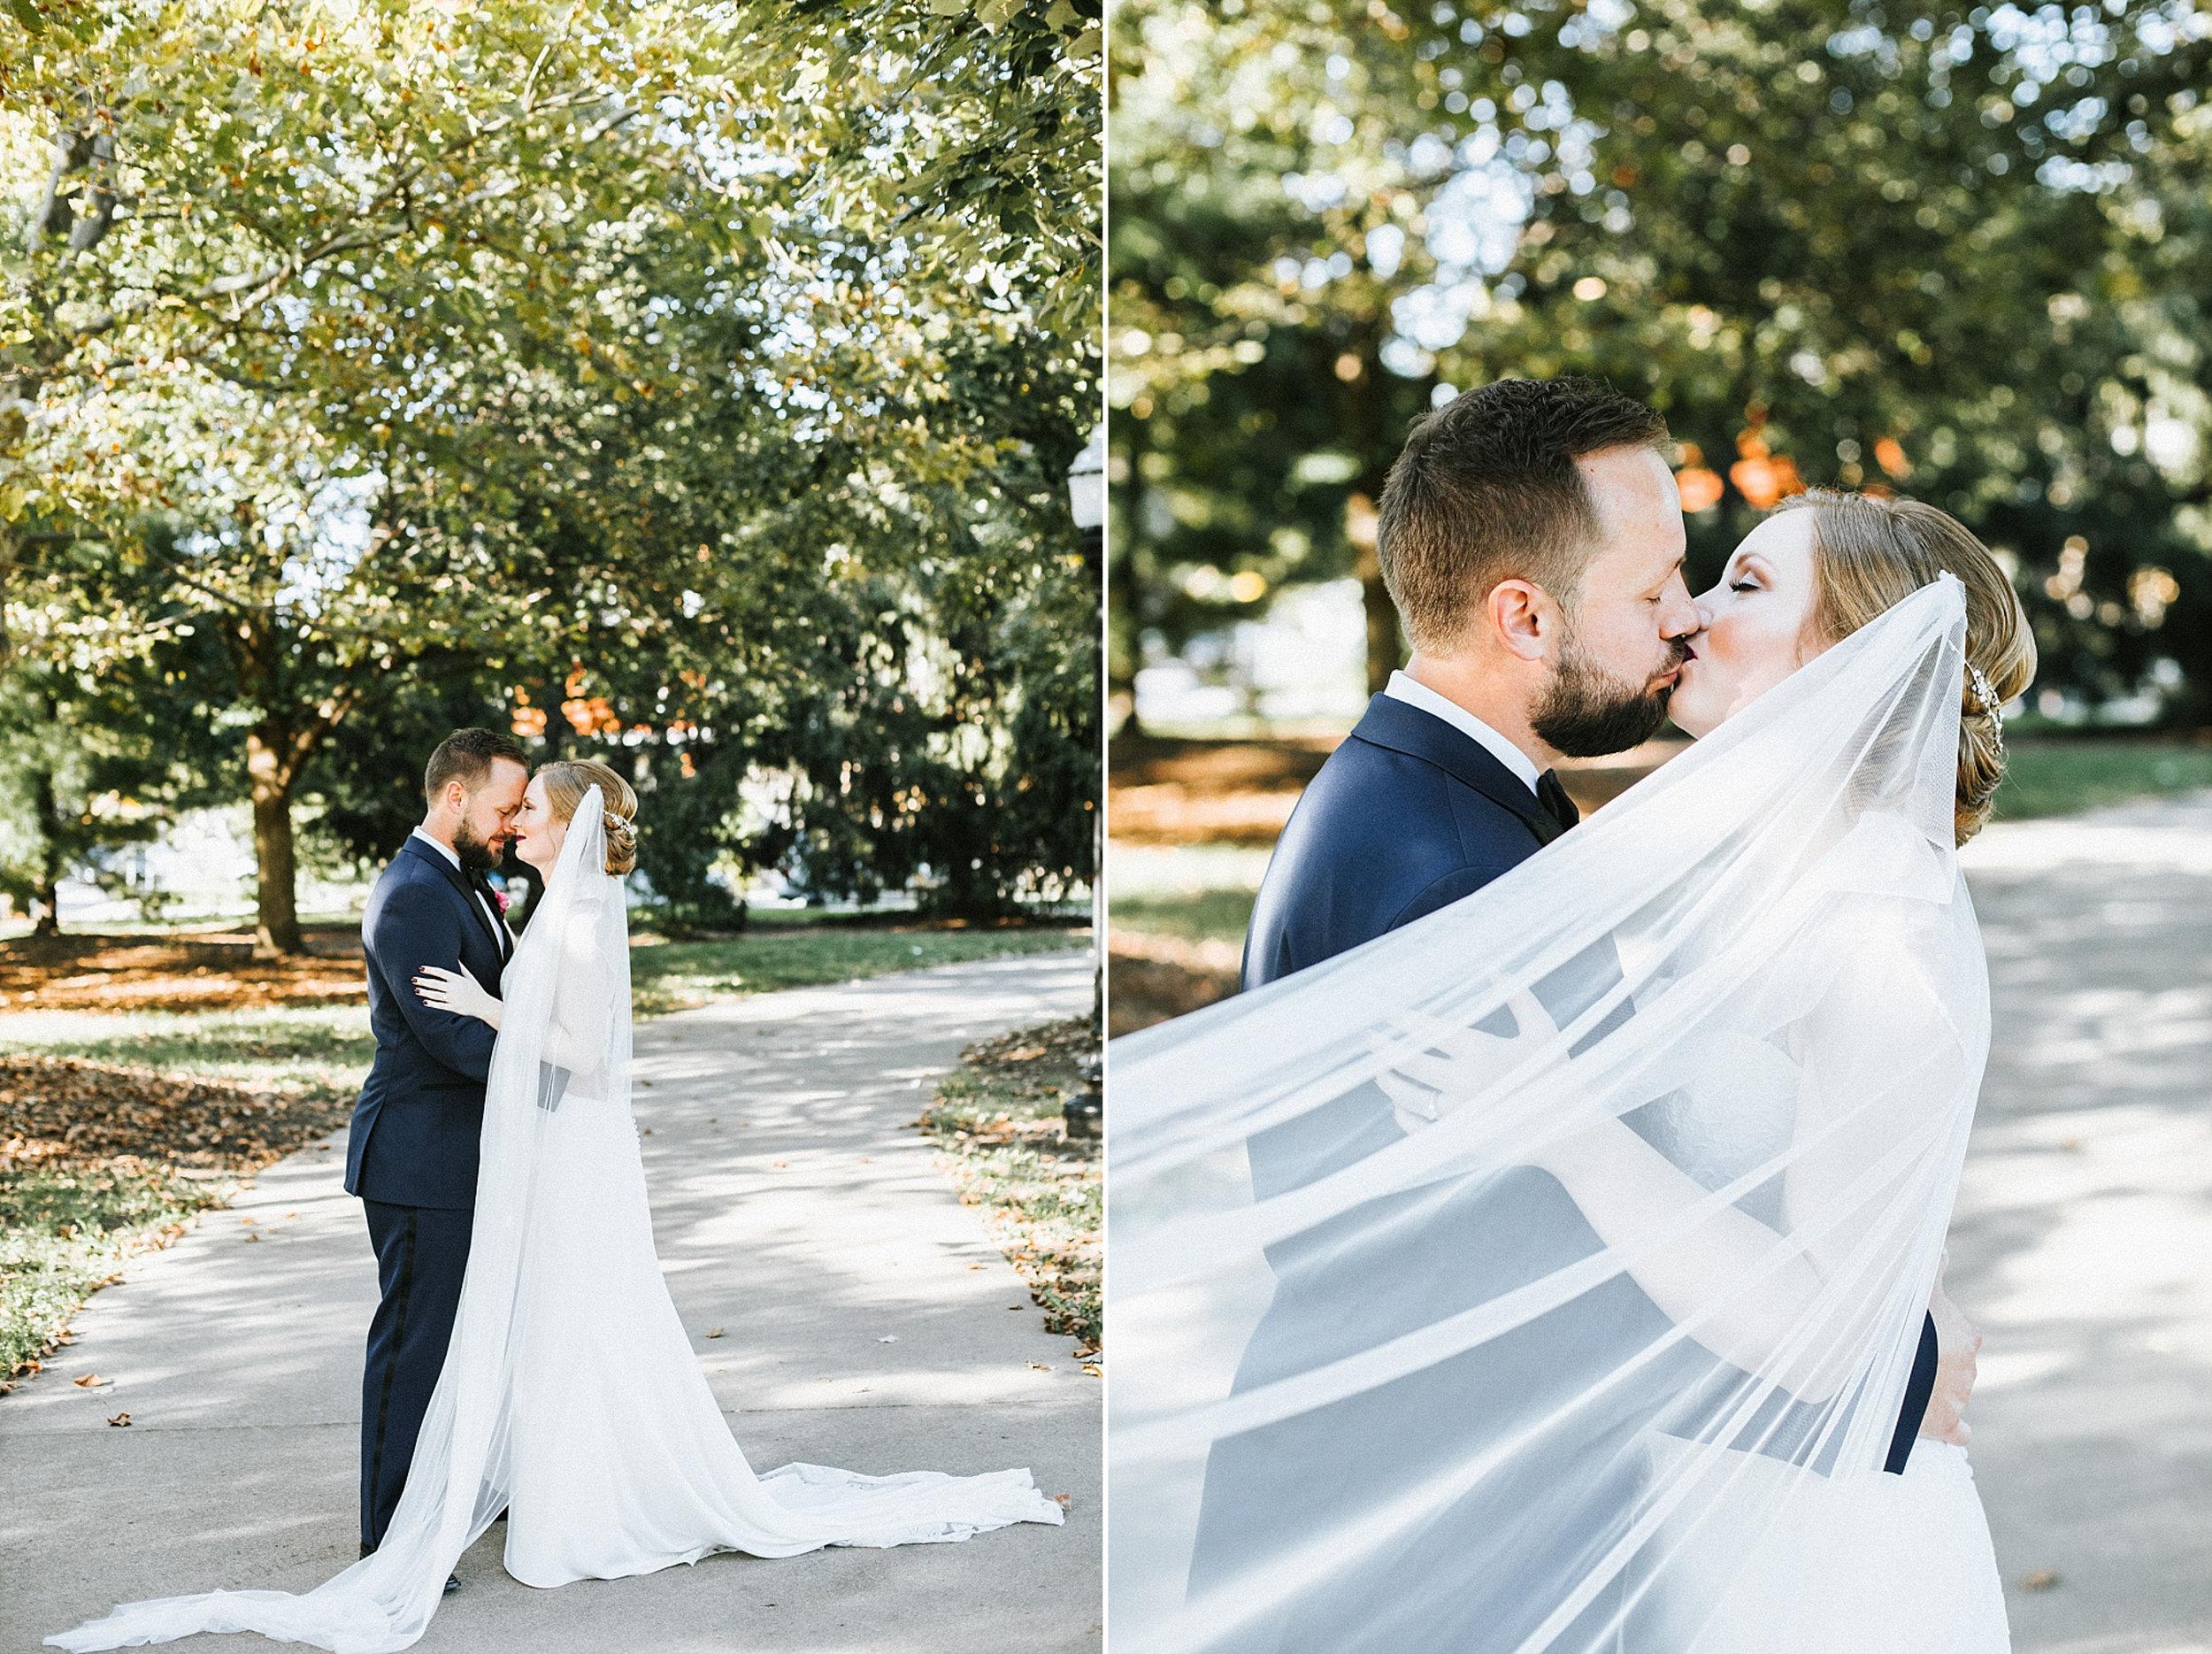 Brooke Townsend Photography - Ohio Wedding Photographer-147.jpg